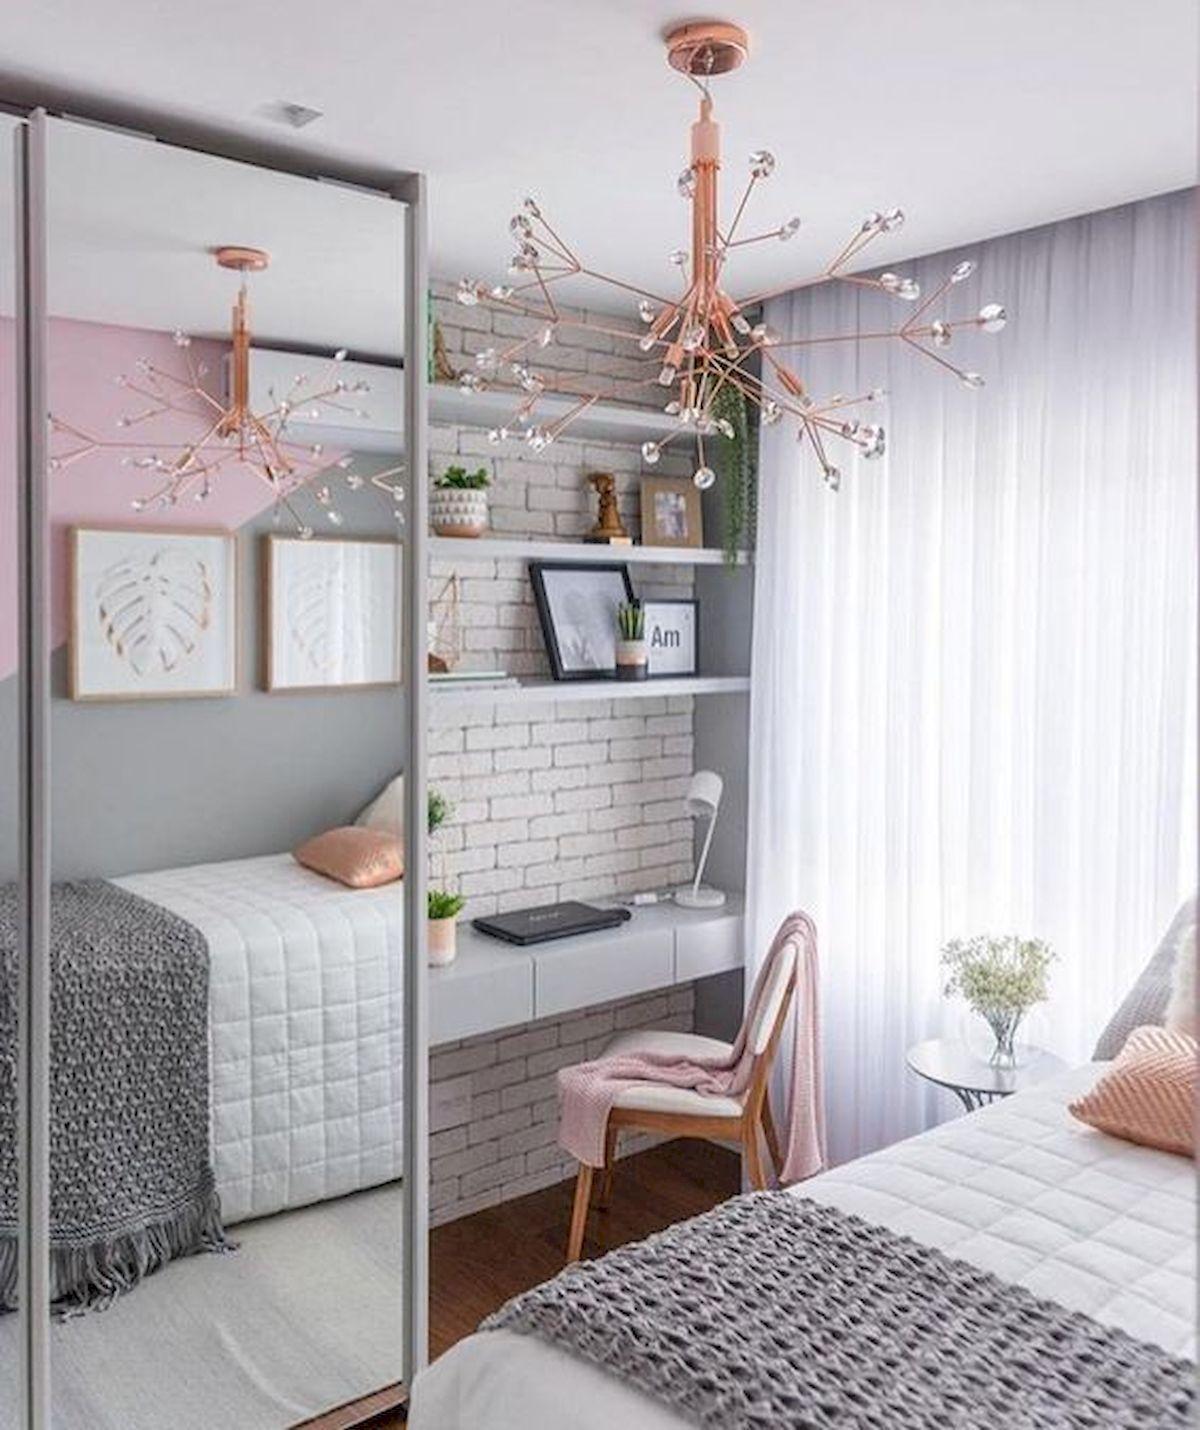 71 Stunning Small Bedroom Design Ideas (1) - artmyideas #bedroomapartment